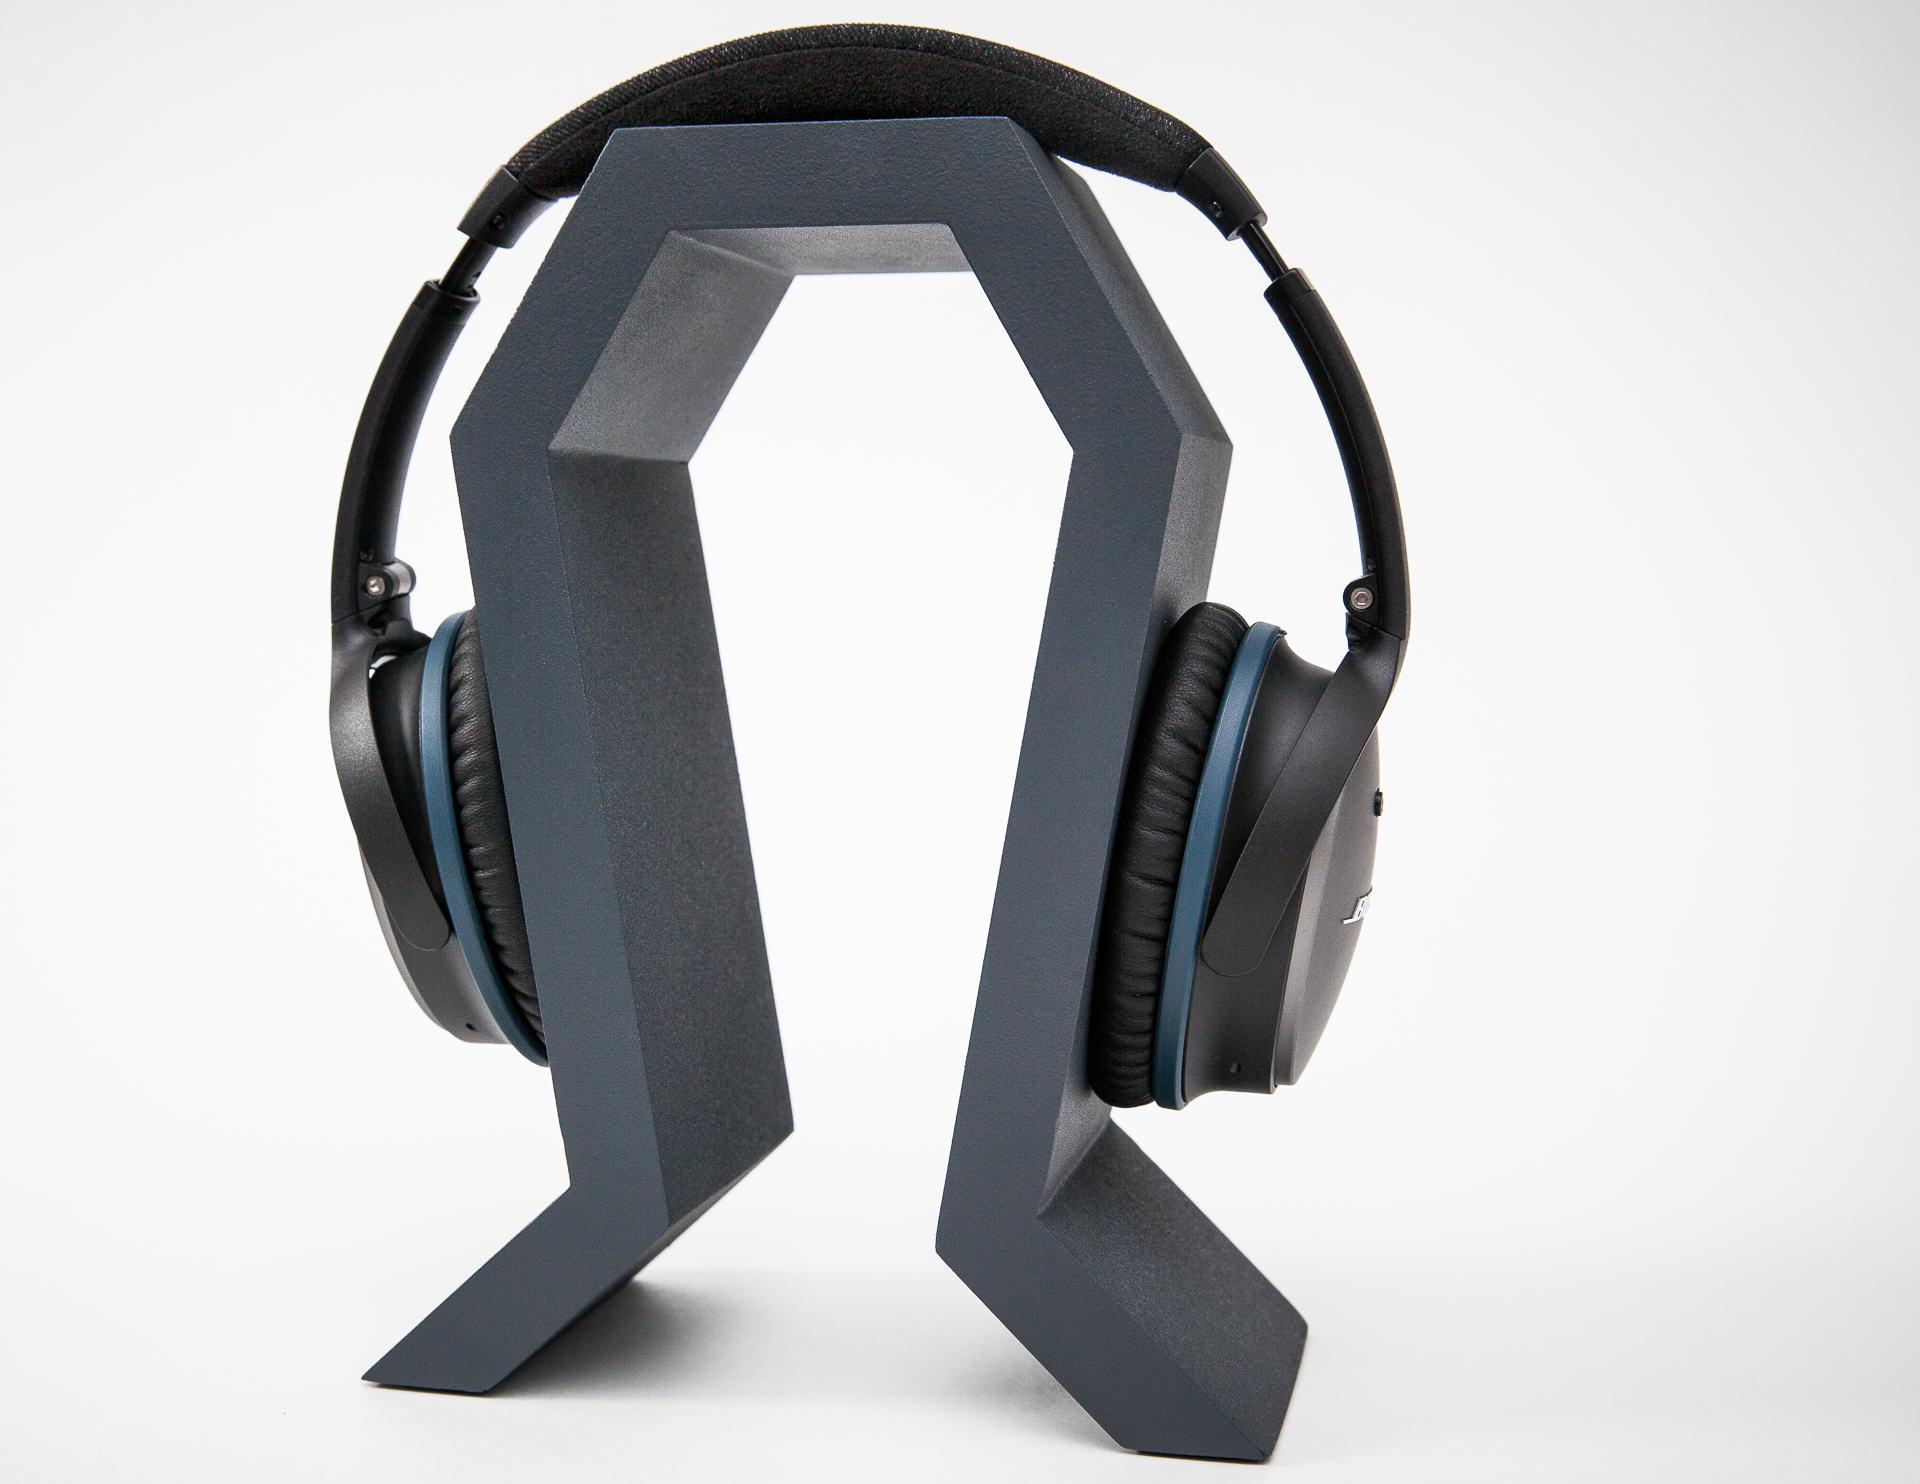 Headphone Stand Designs : Jan geloen monastic headphone stand